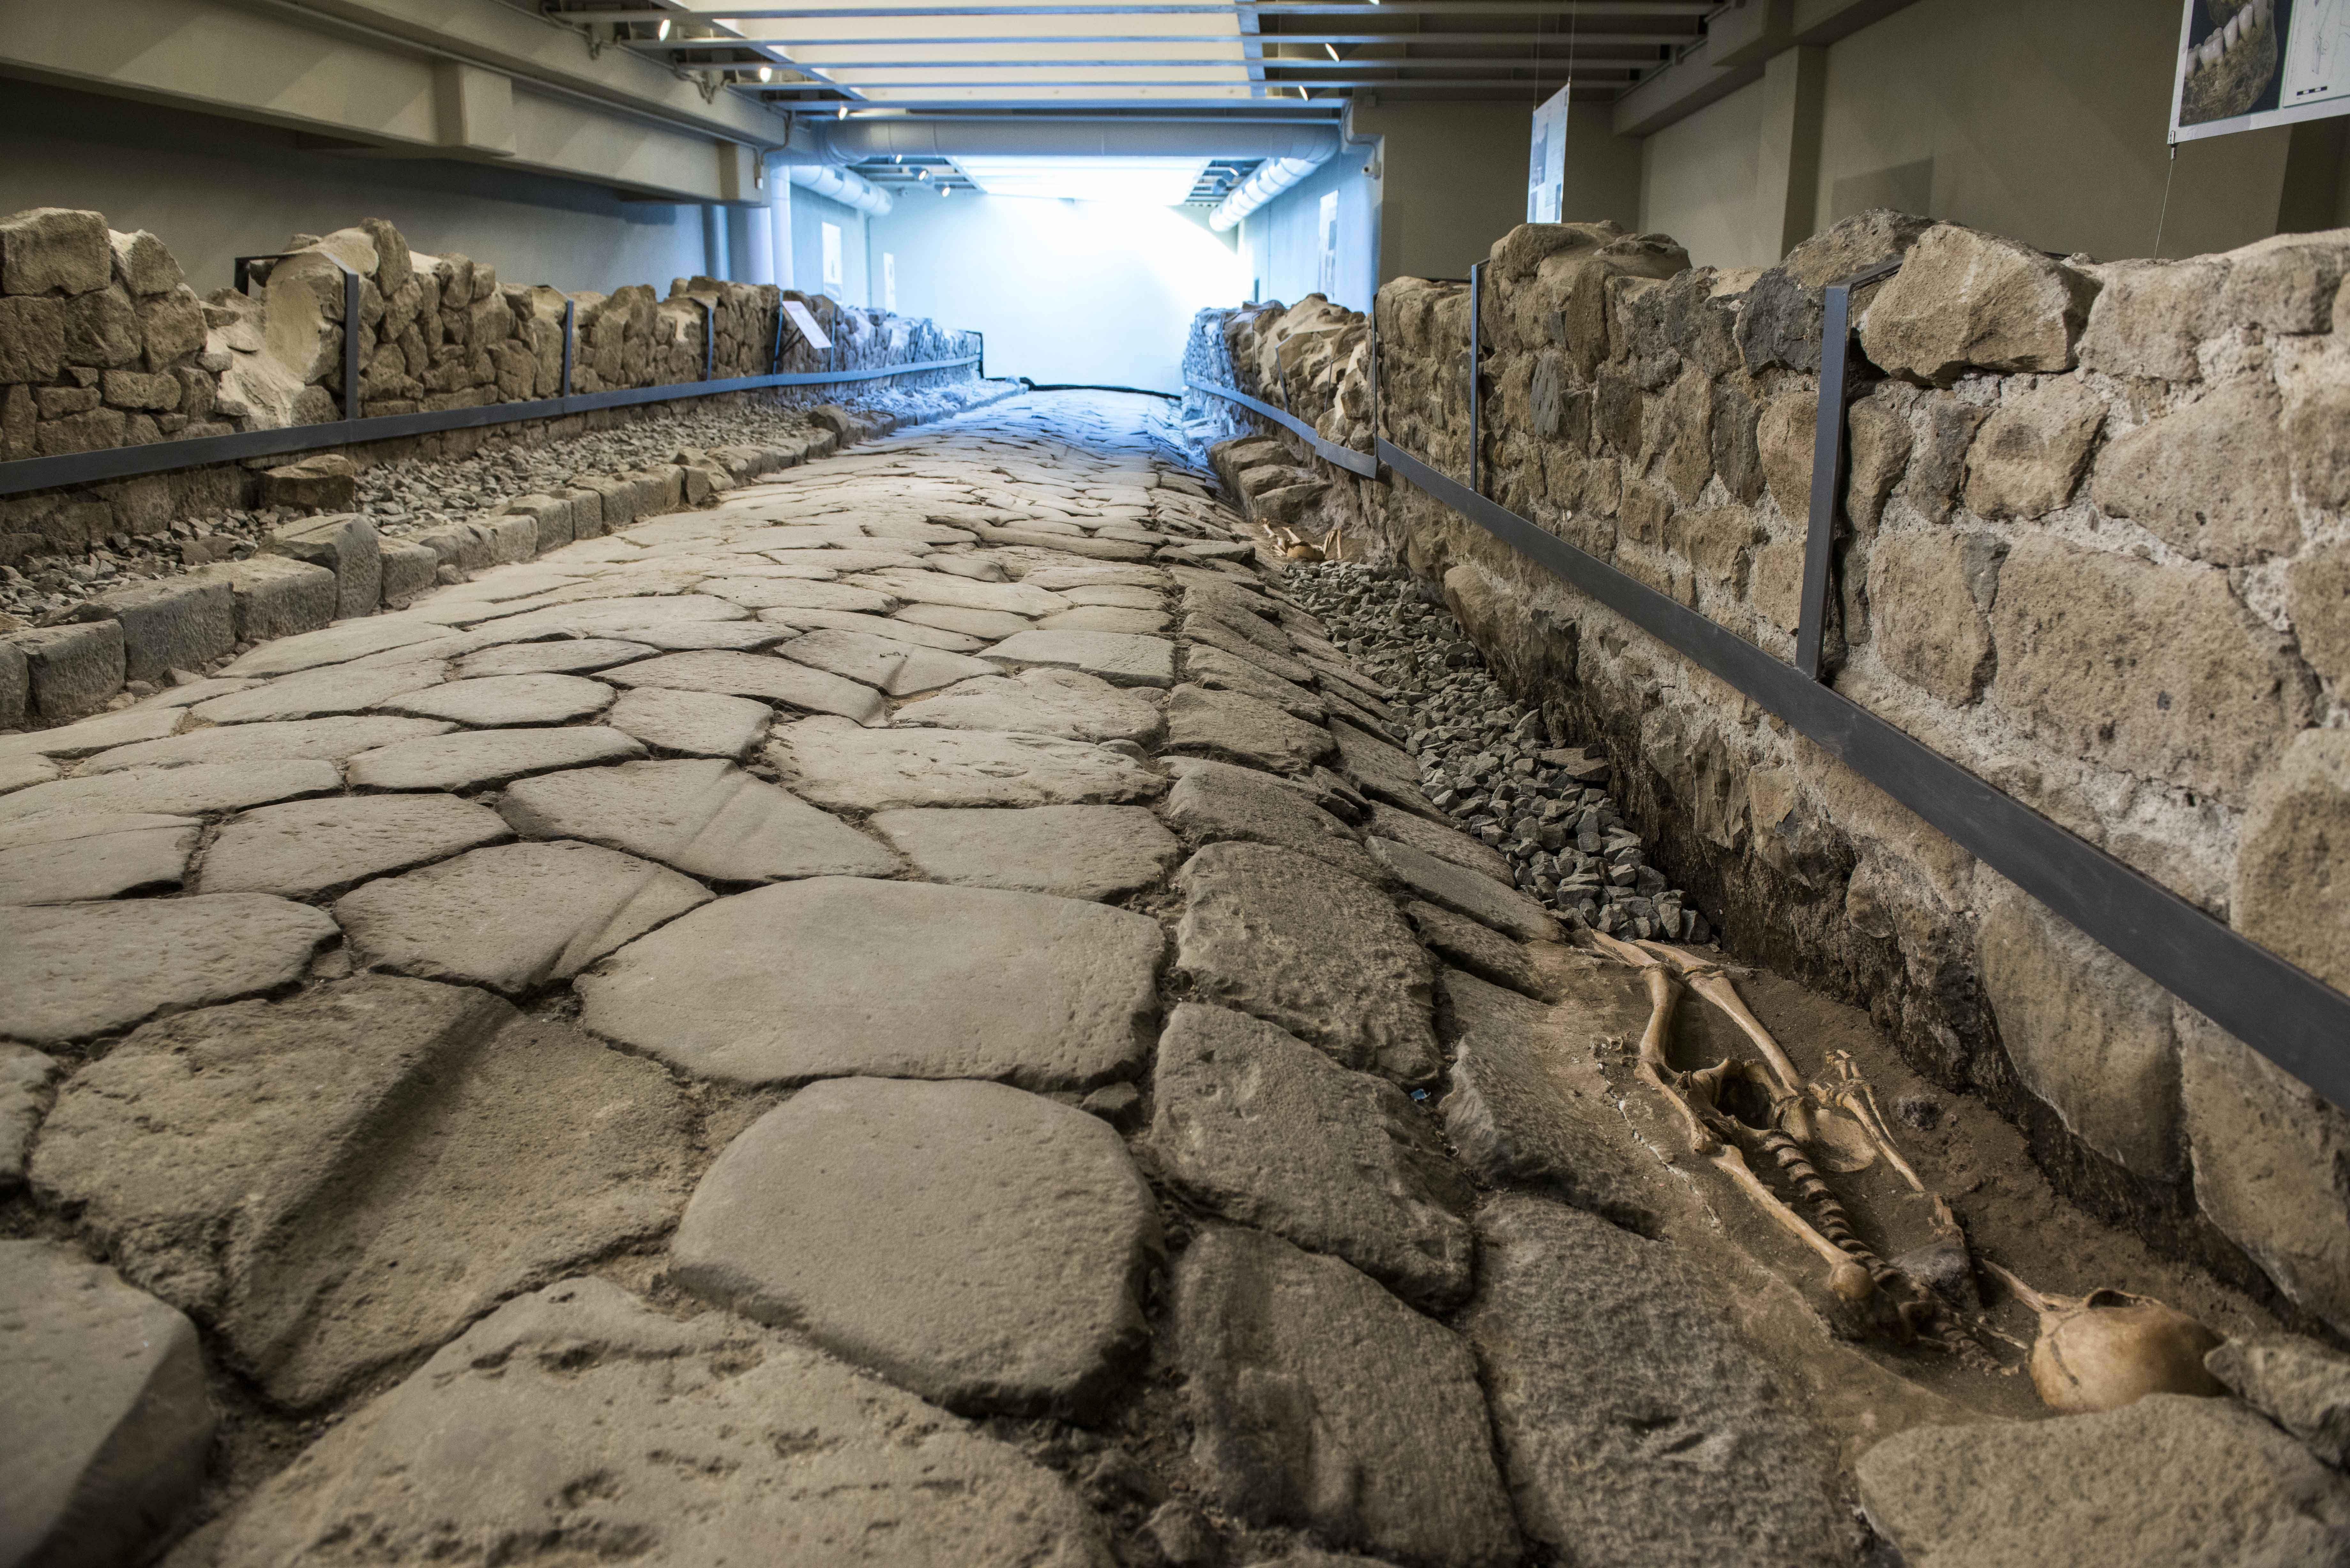 Road With Cast Of Skeleton In Situ